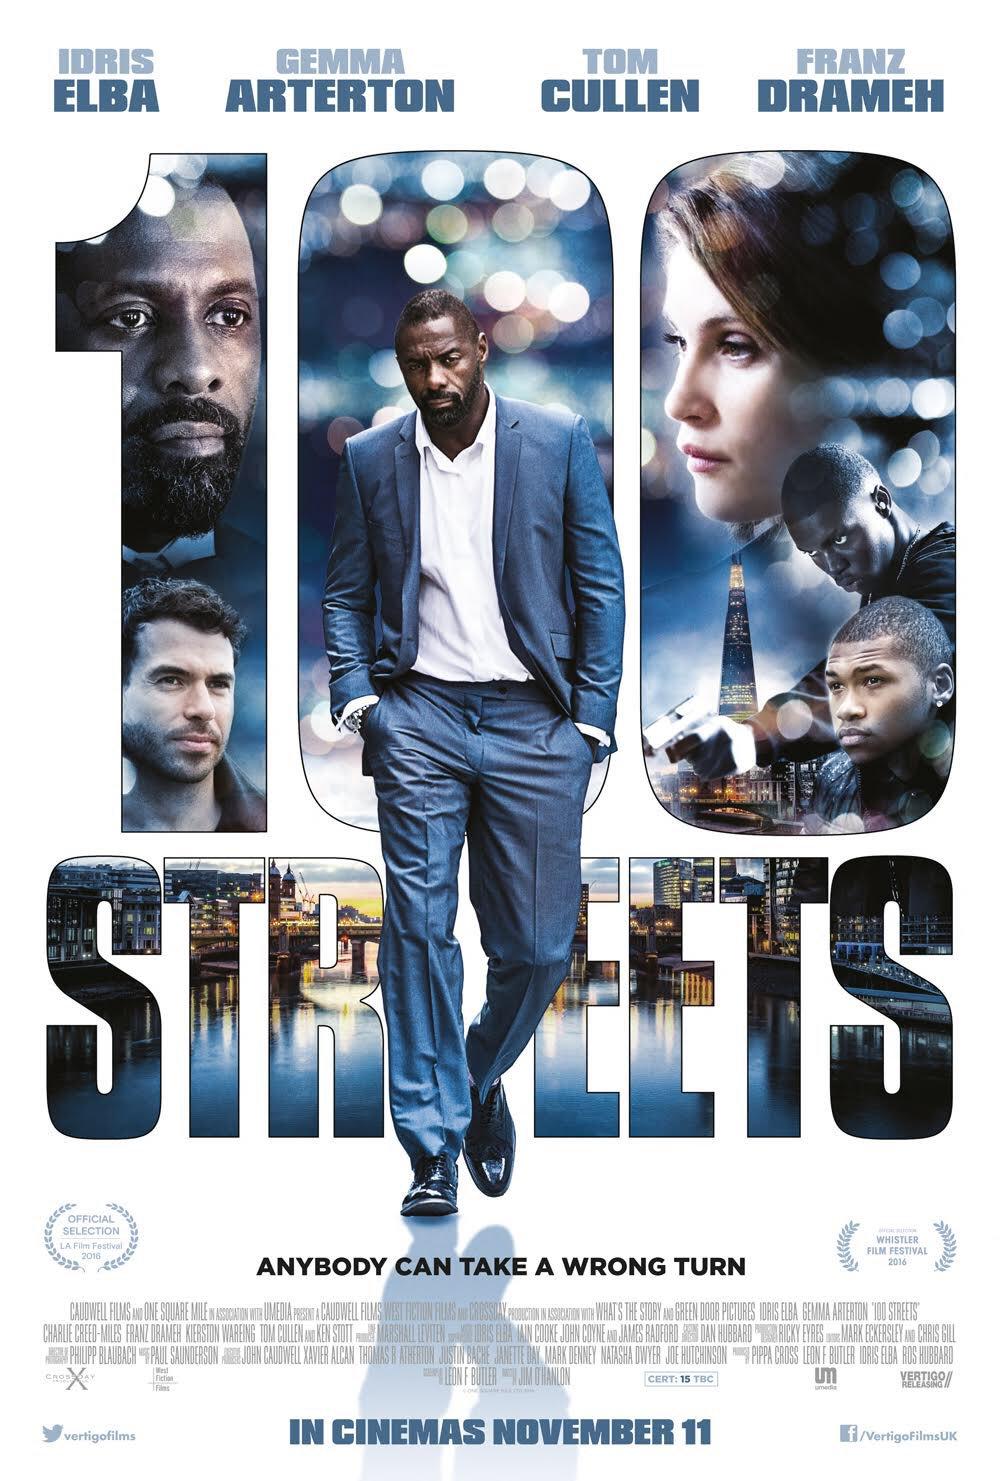 100 Streets Film